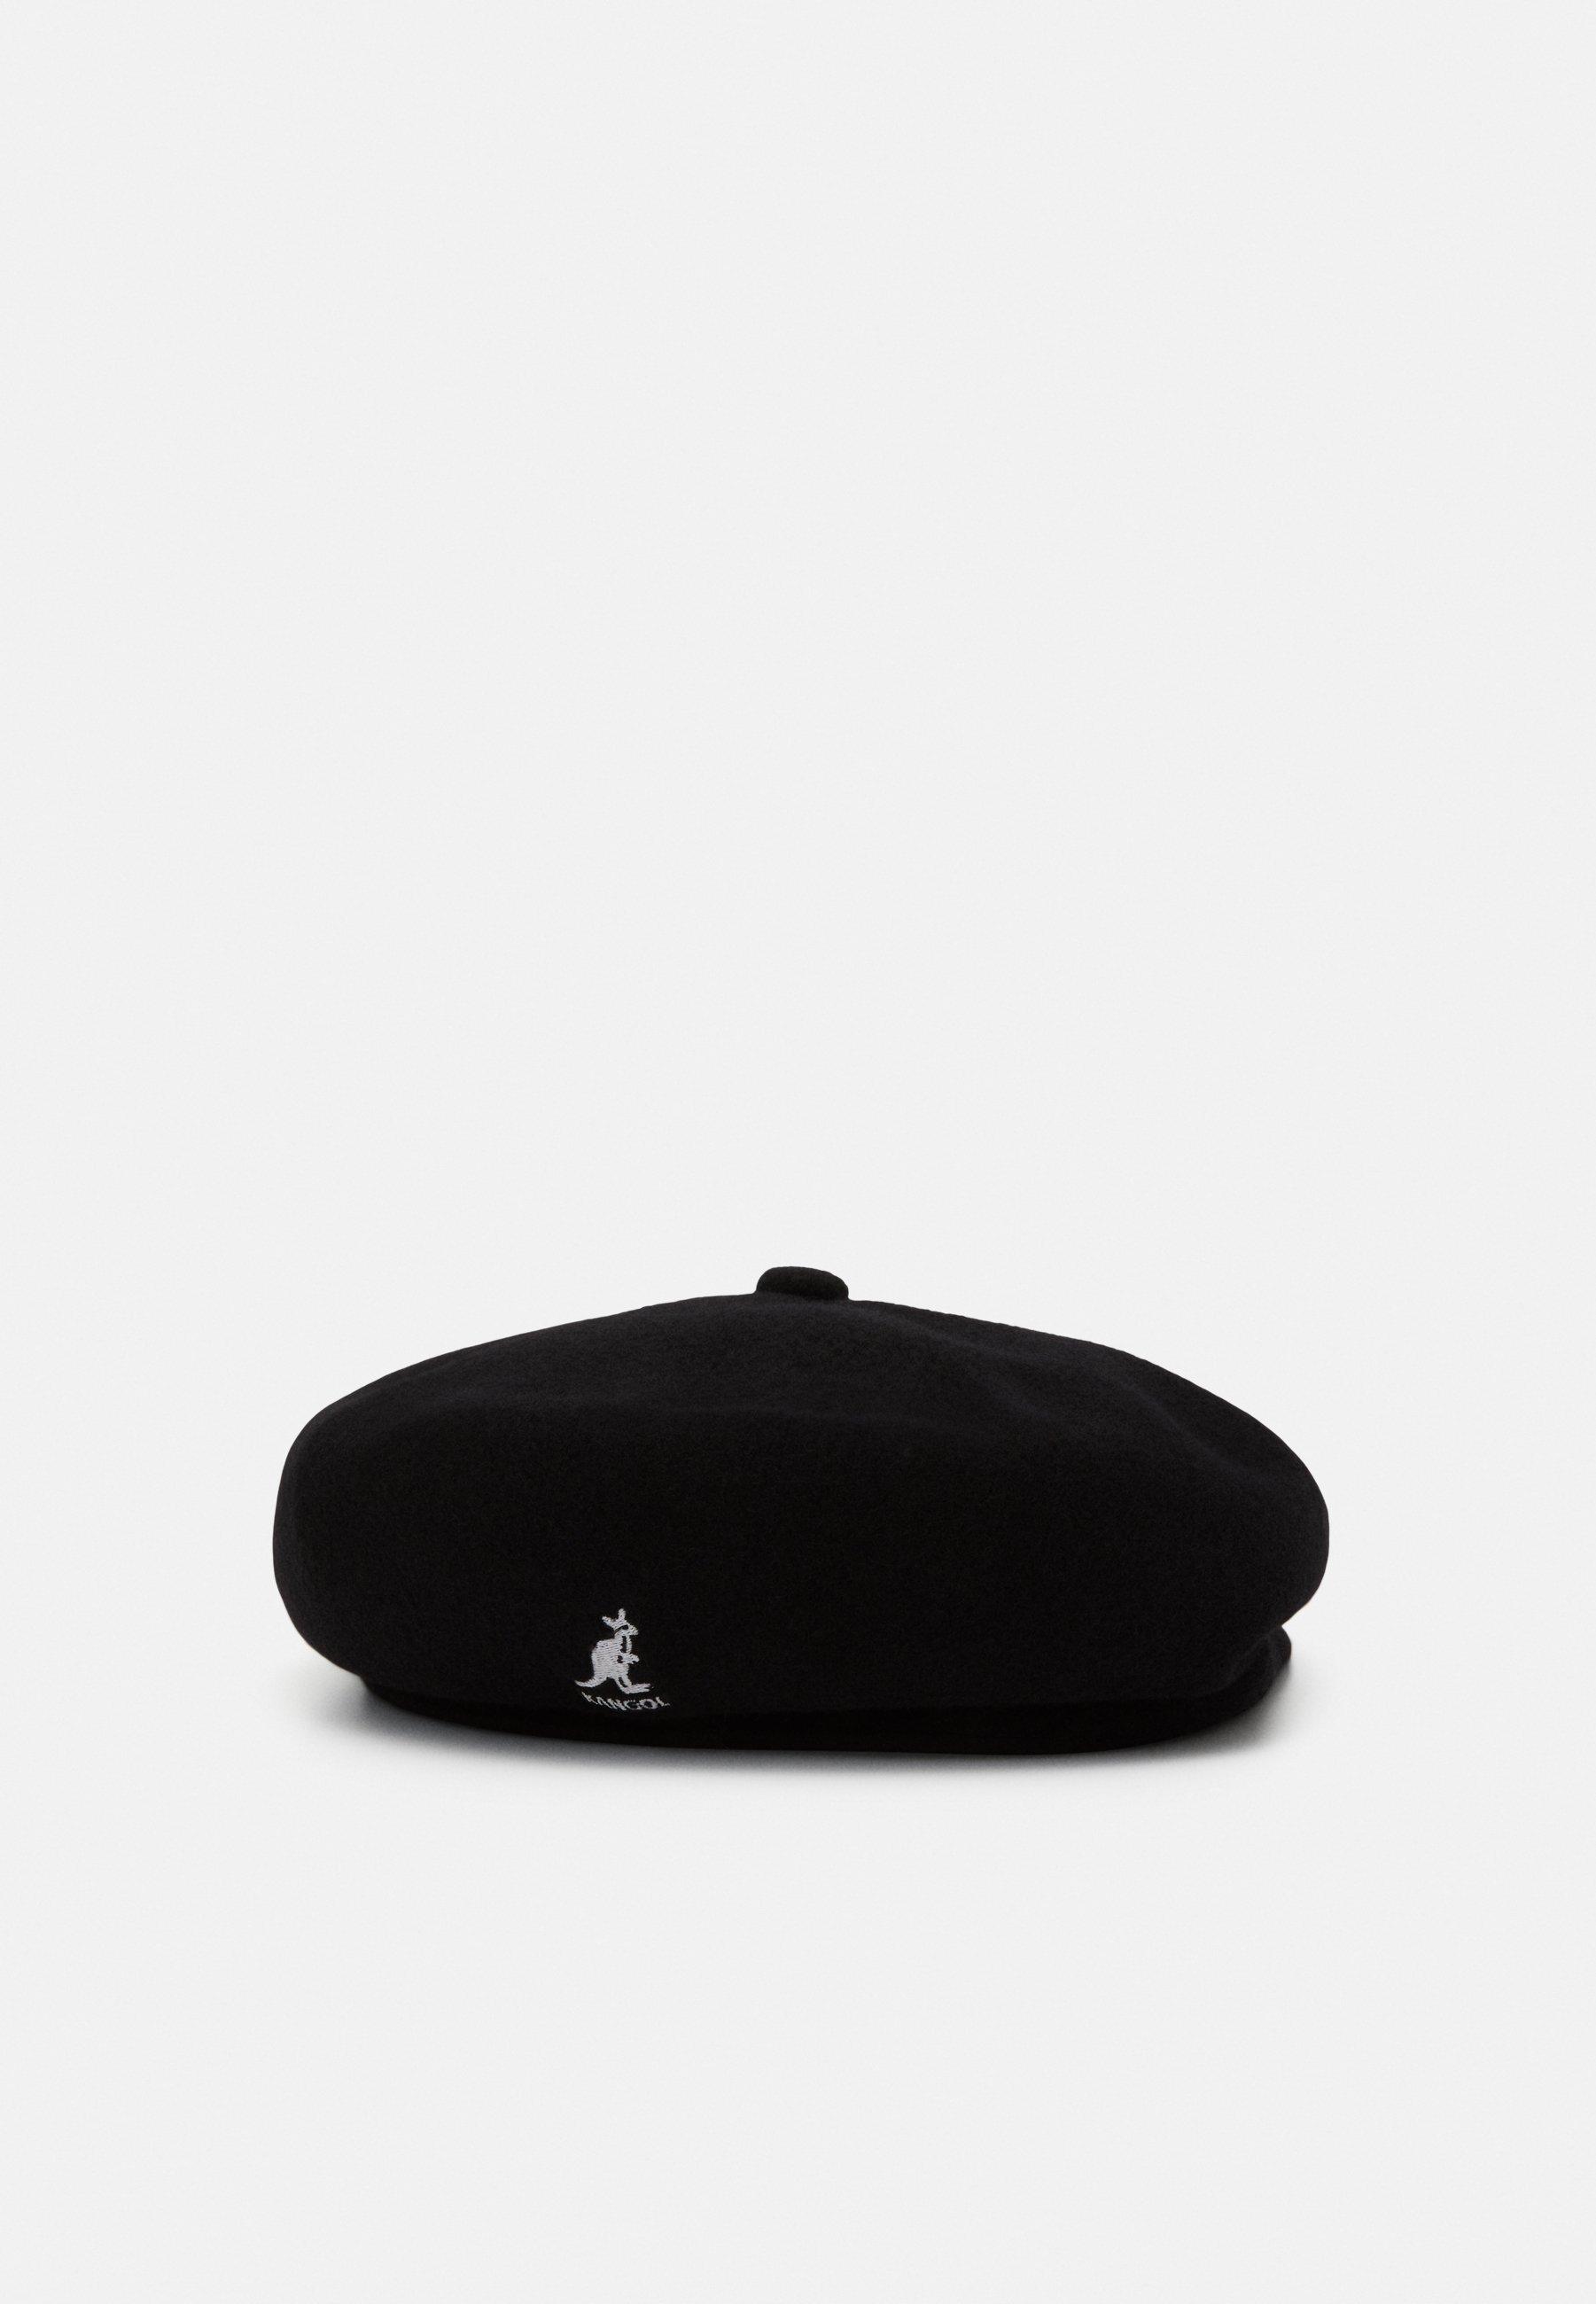 Kangol Spitfire - Hut Black/schwarz